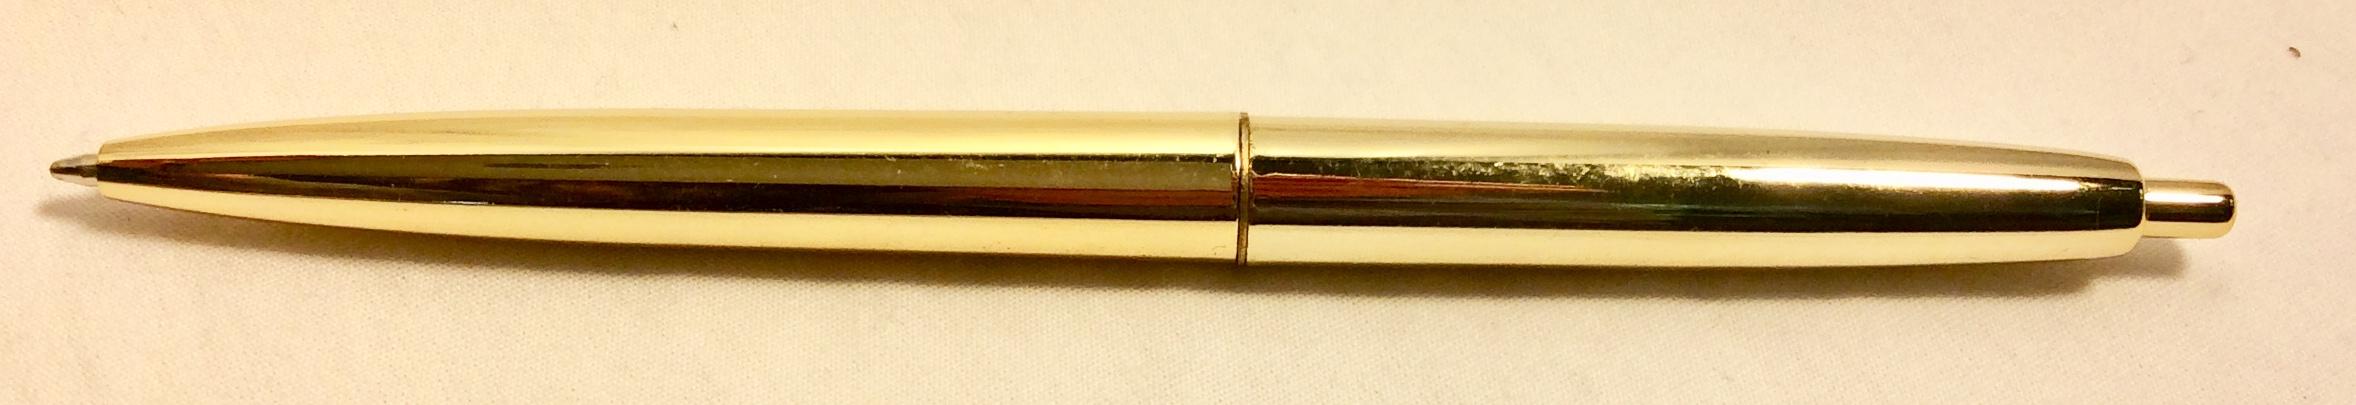 Gold pens